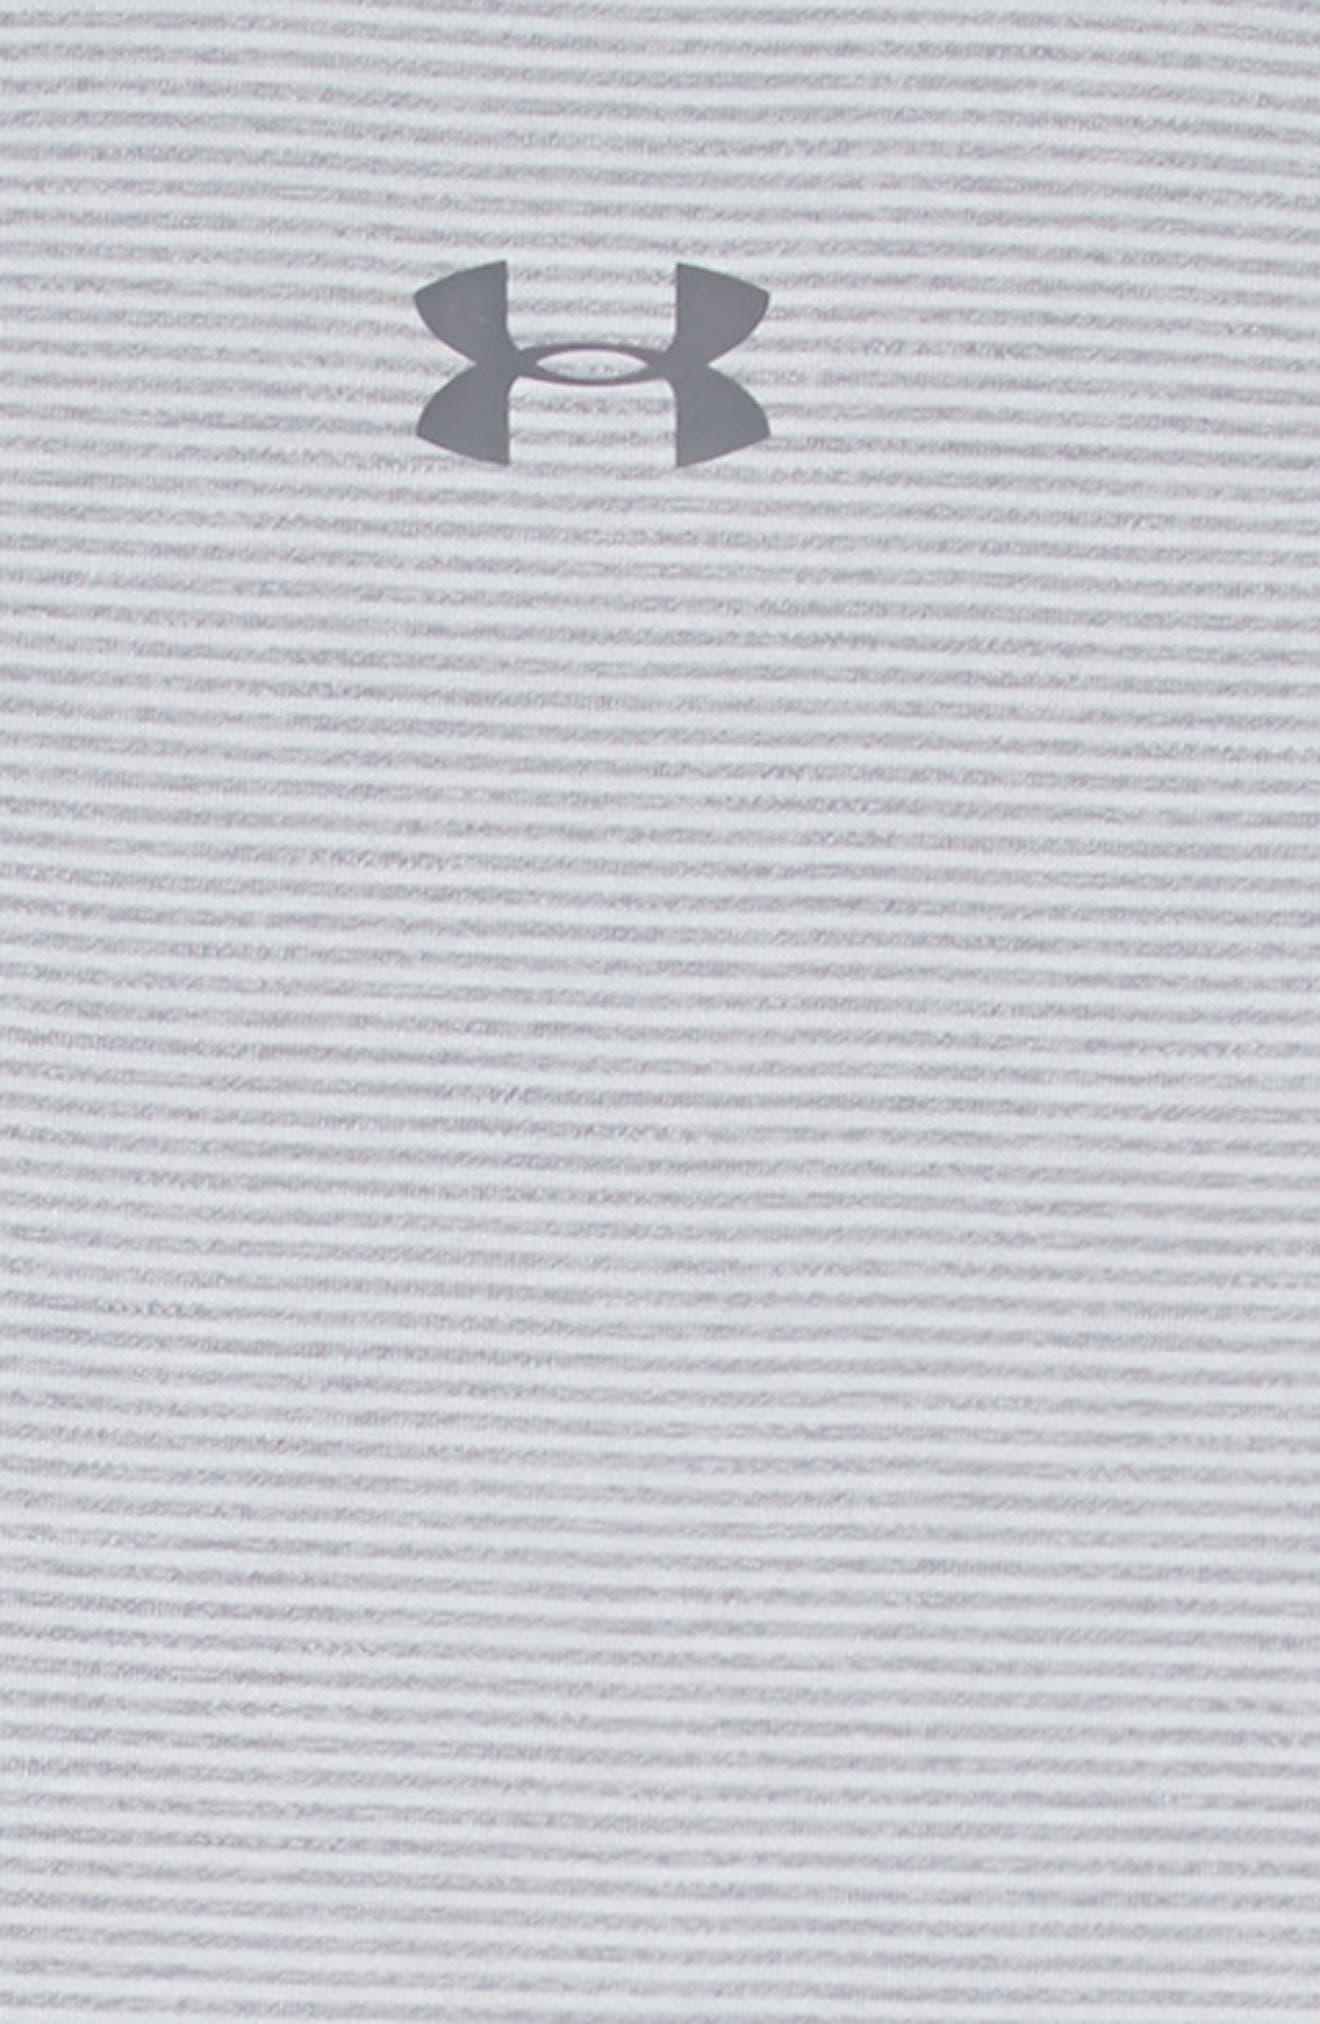 Threadborne Polo,                             Alternate thumbnail 2, color,                             OVERCAST GRAY/ RHINO GRAY